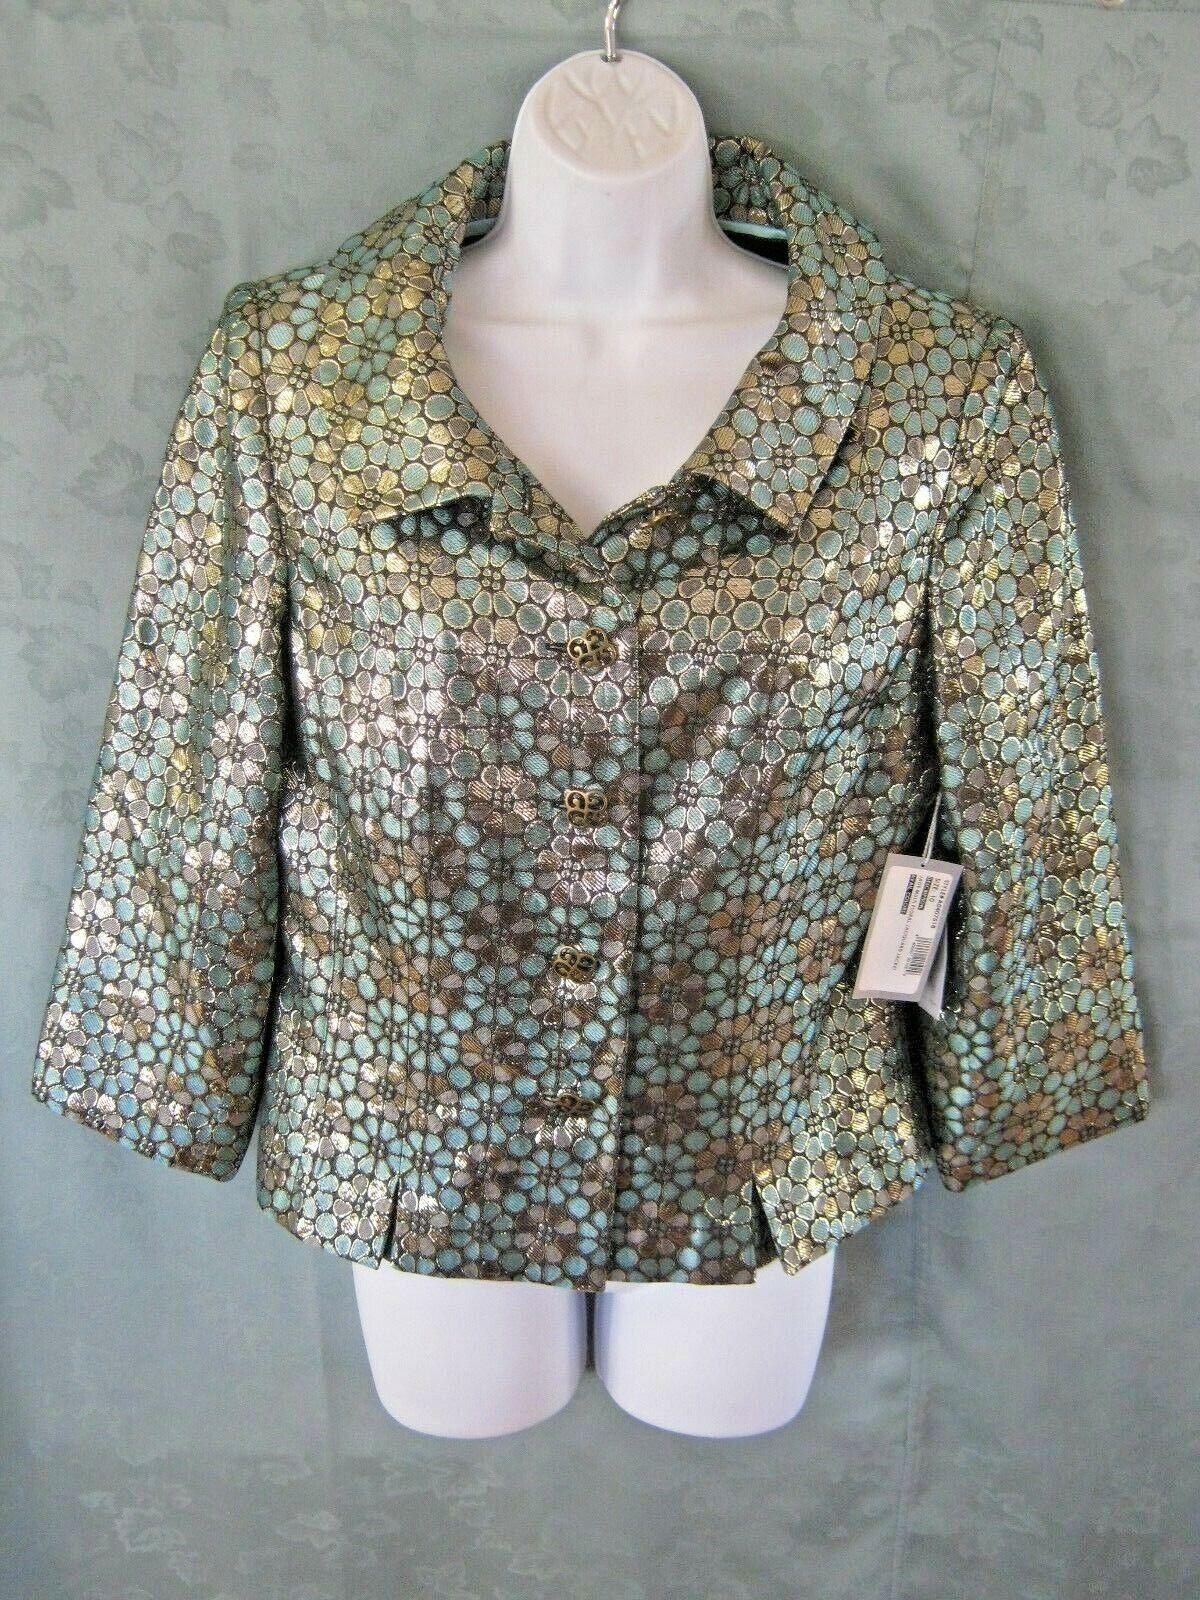 Bill Blass Size 10 Metallic Floral Jacquard Jacket NWT Dressy Fully Lined